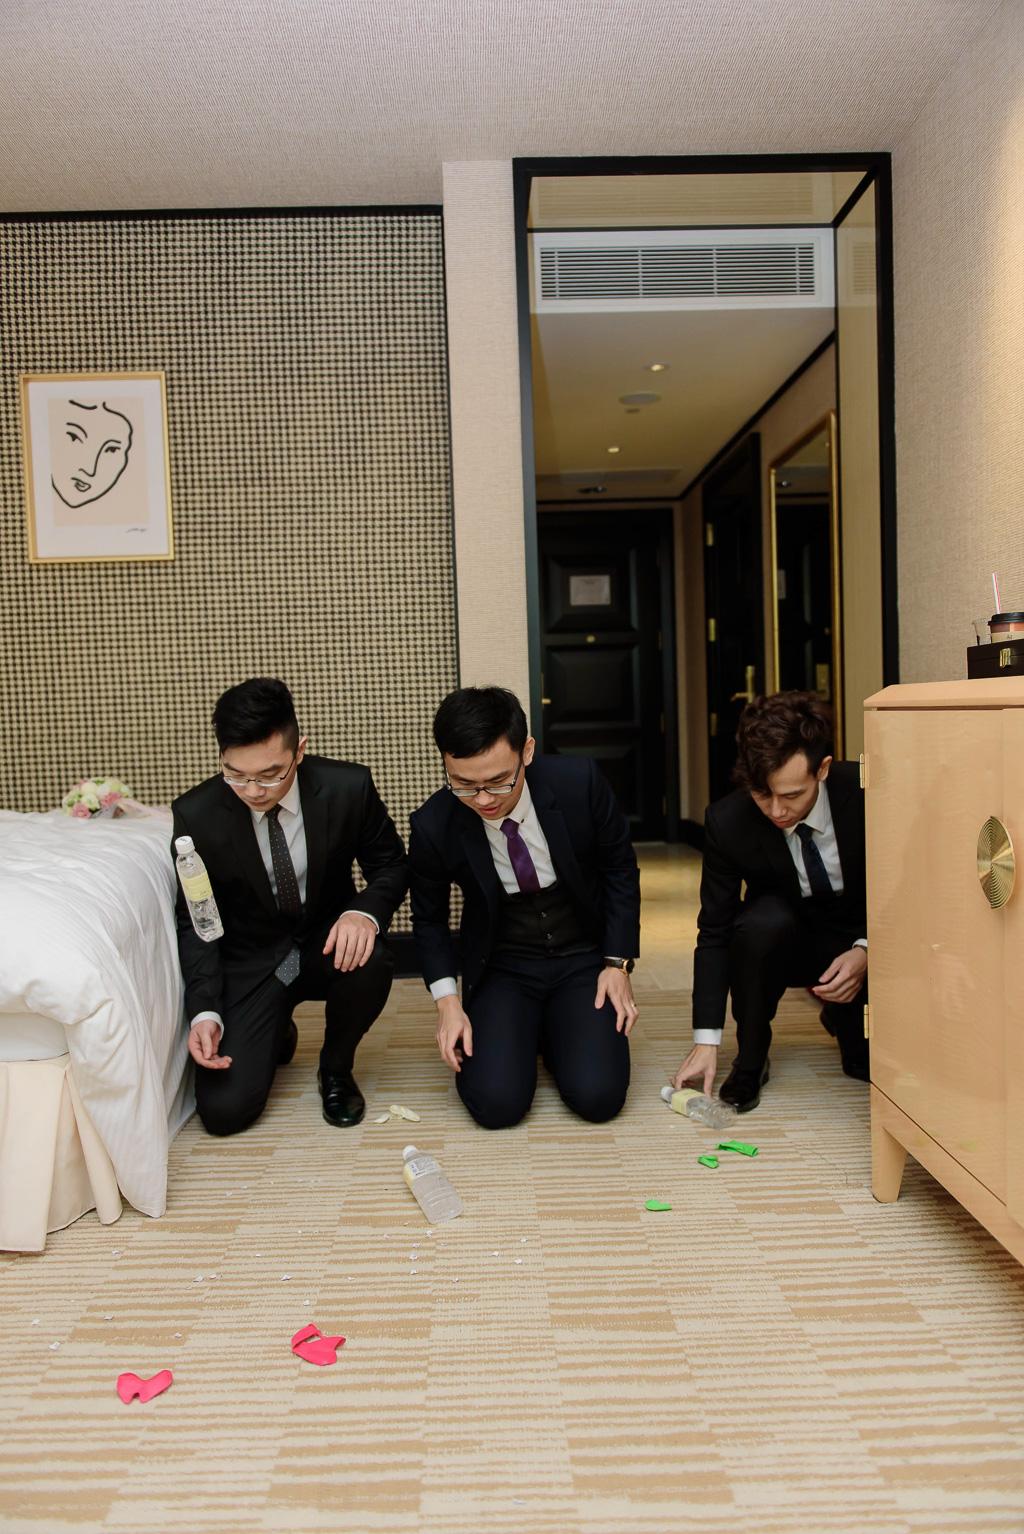 Wedding day-0033 ,僑園婚攝,台中僑園,僑園婚宴,新秘Alice ,婚攝小勇,台北婚攝, 小淑造型團隊